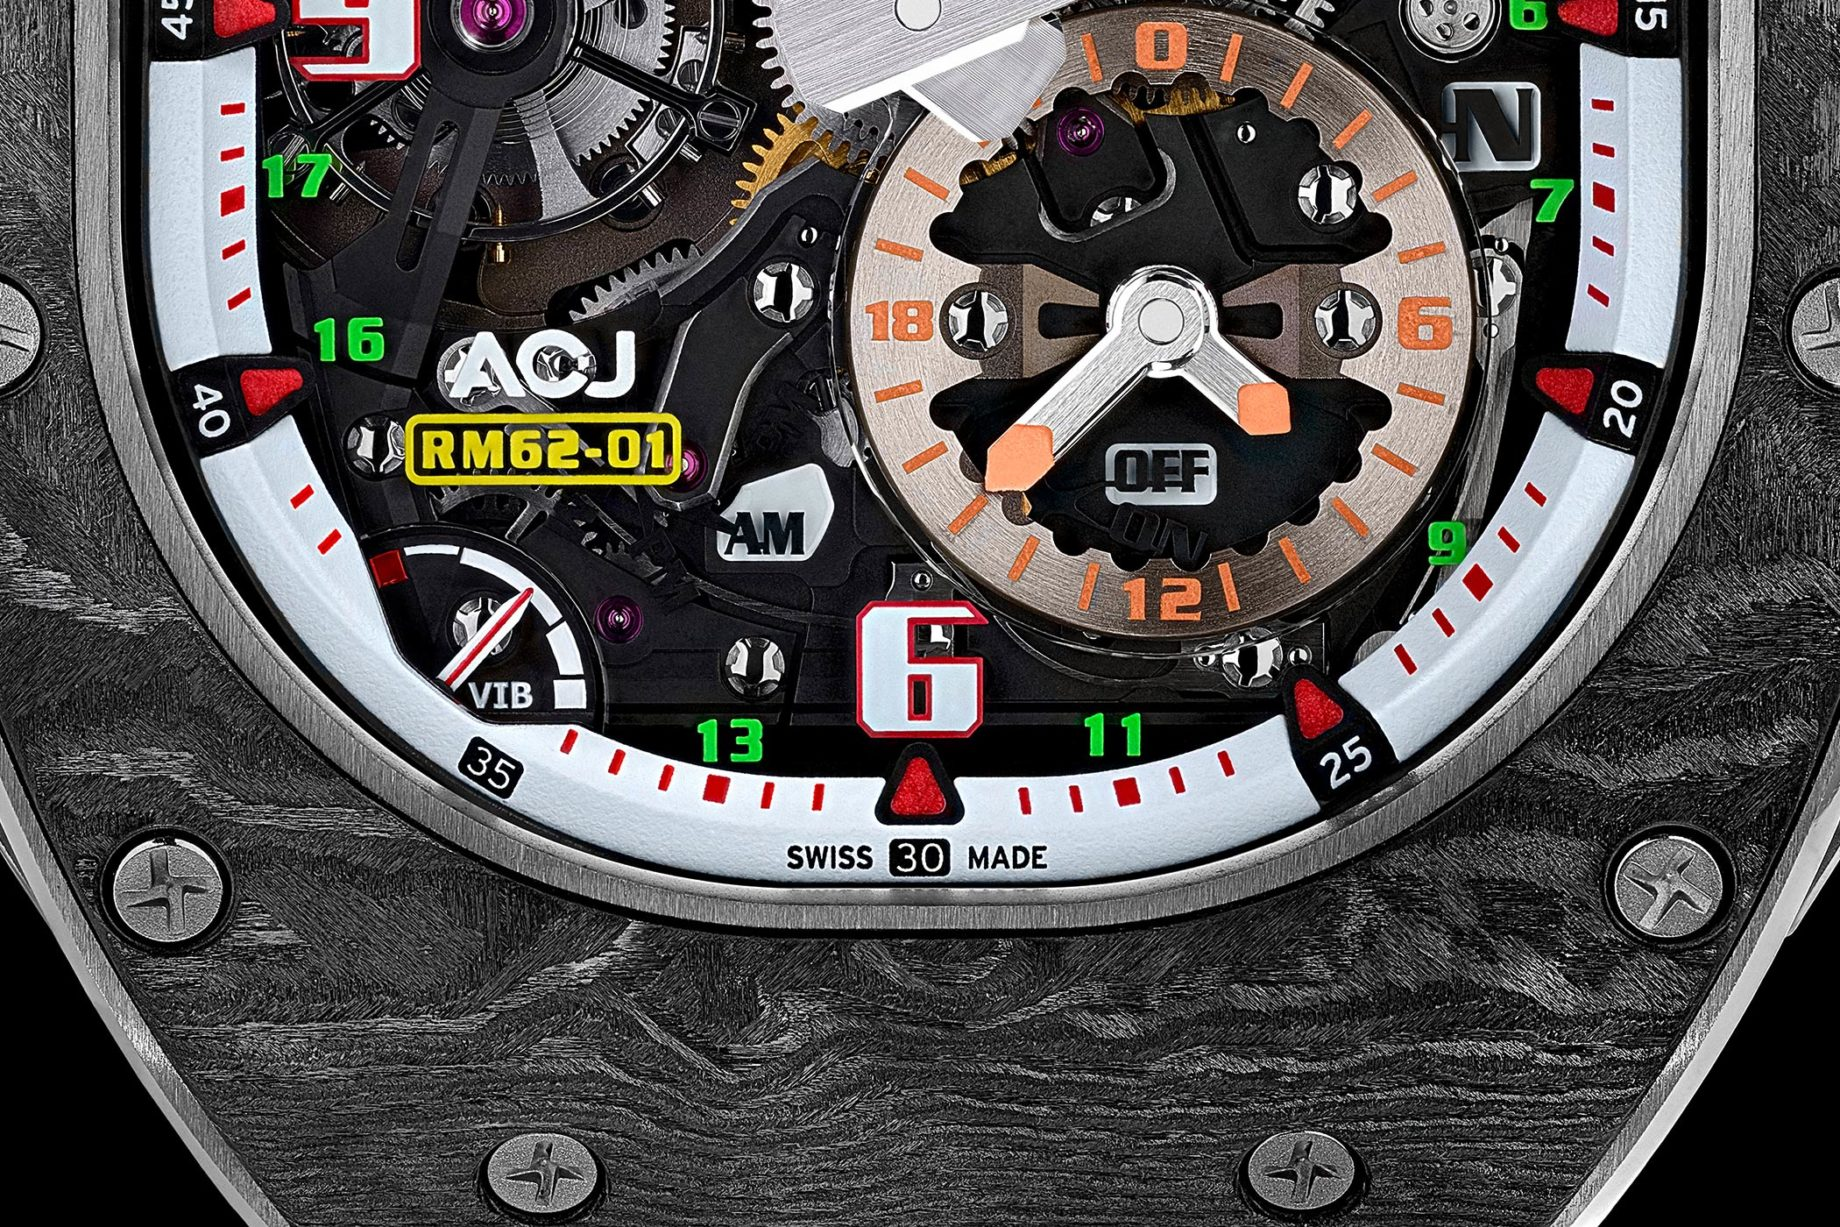 Richard Mille RM 62-01 Tourbillon Vibrating Alarm Airbus Corporate Jets